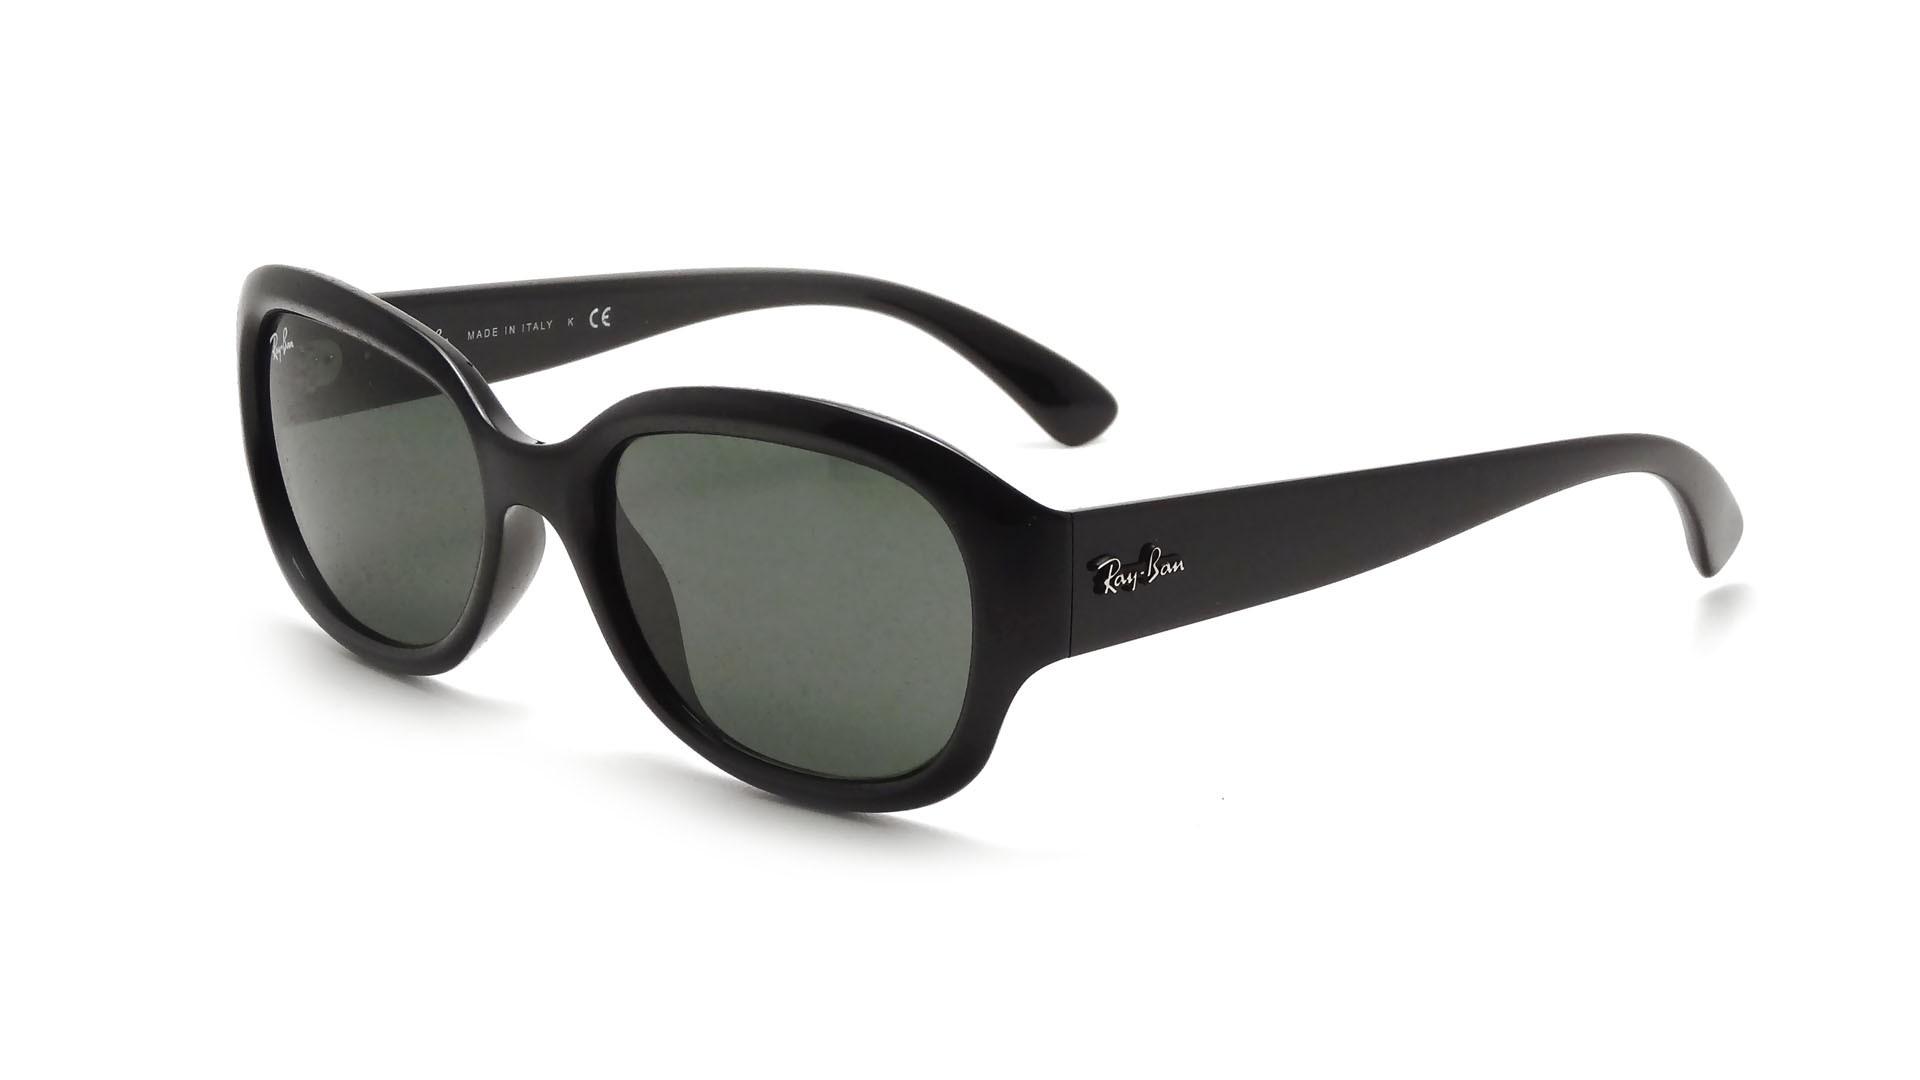 d48ca023ac Sunglasses Ray-Ban RB4198 601 55-18 Black Medium